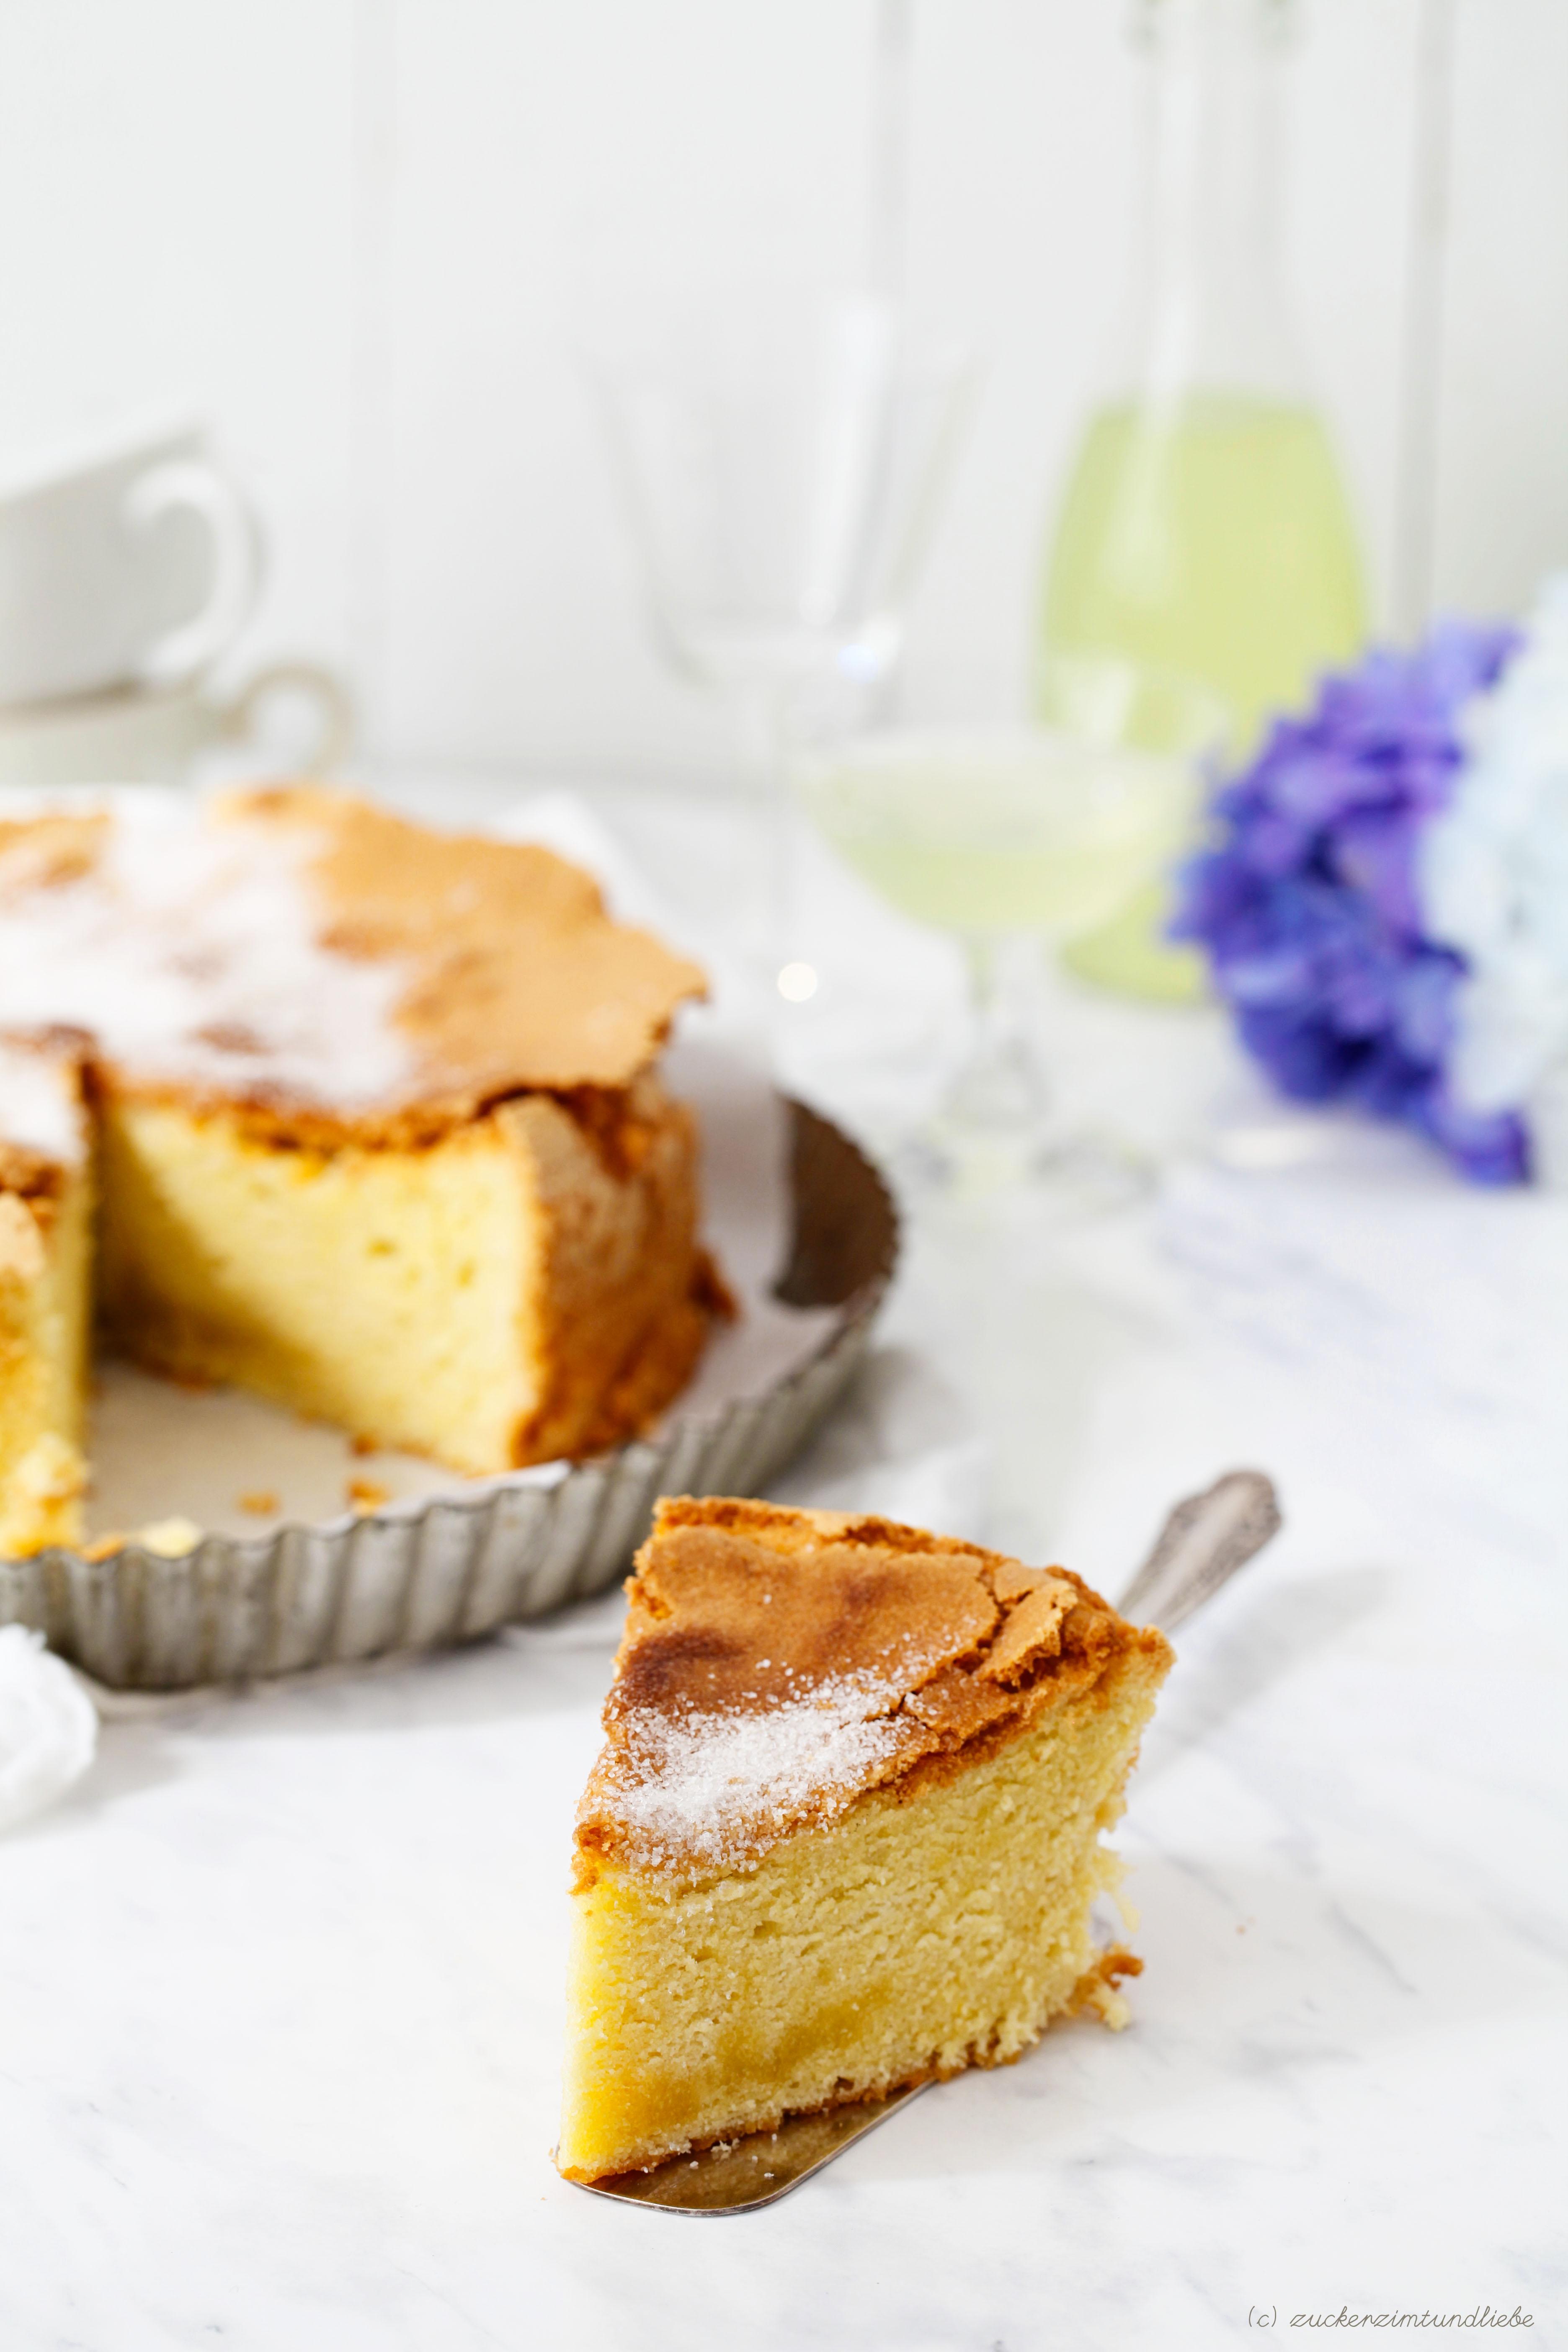 Zuckerzimtundliebe Olivenöl Kuchen Limoncello Rezept2